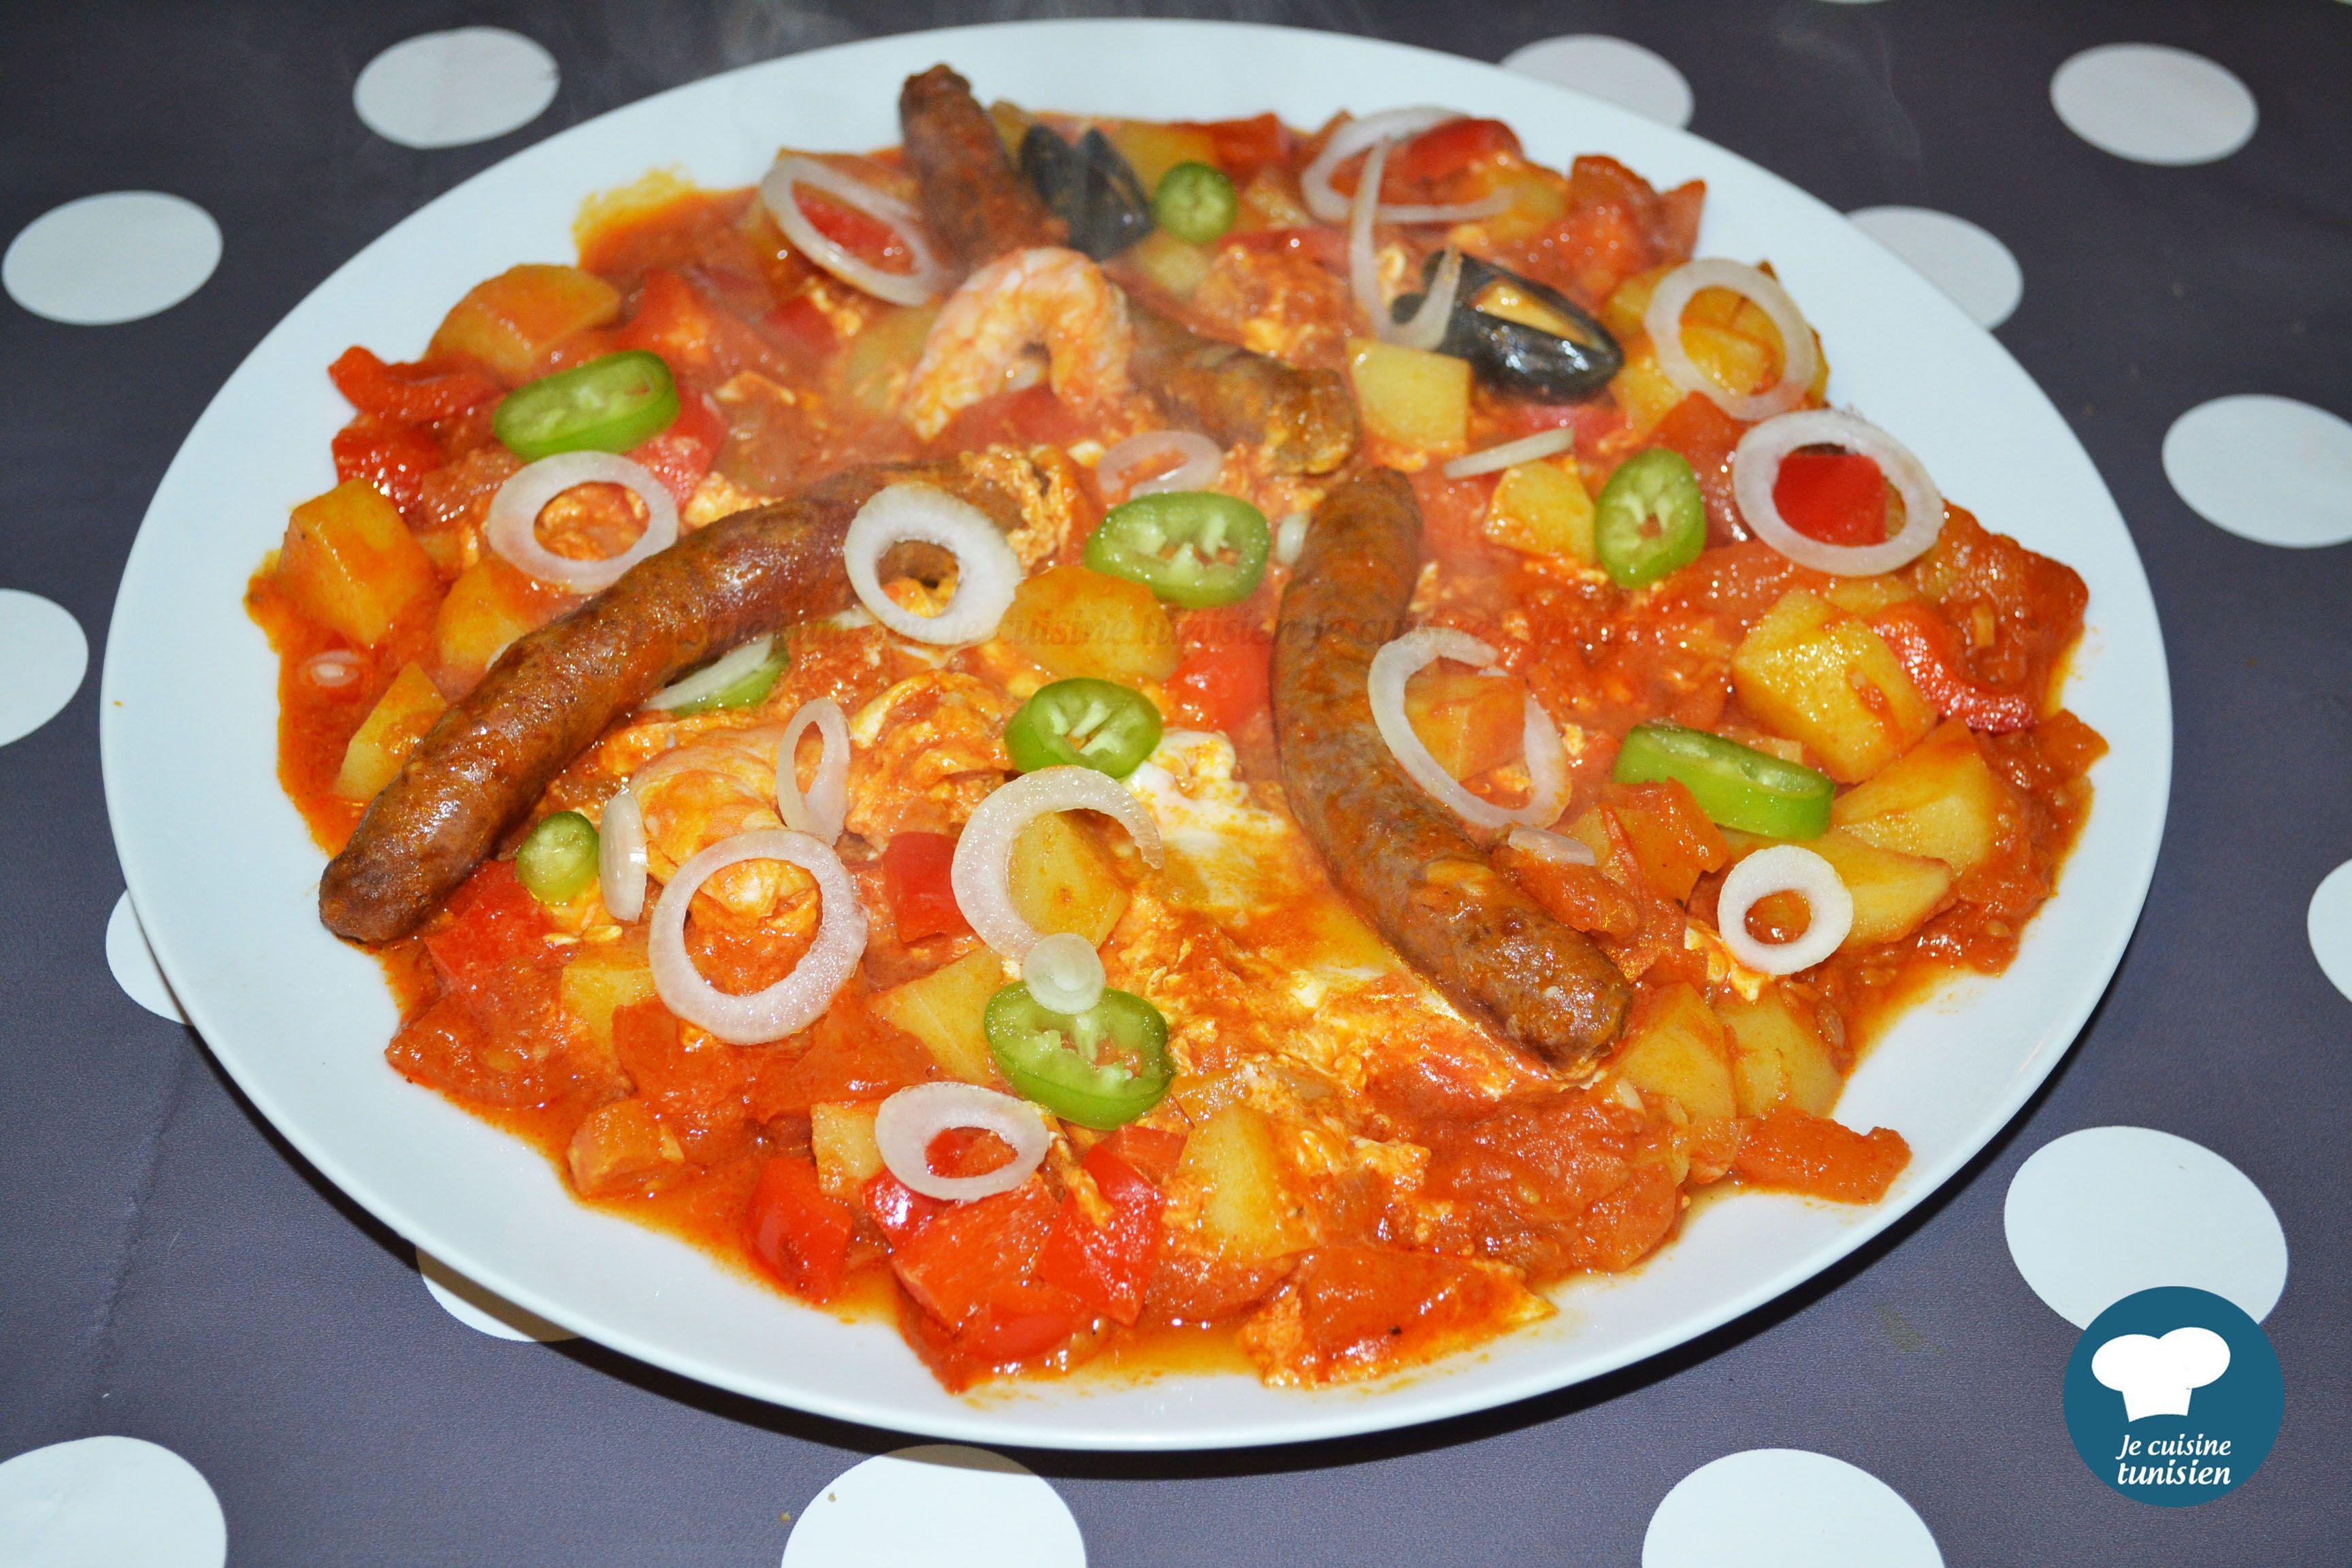 Chakchouka recette tunisienne la cuisine tunisienne - Cuisine tunisienne ramadan ...